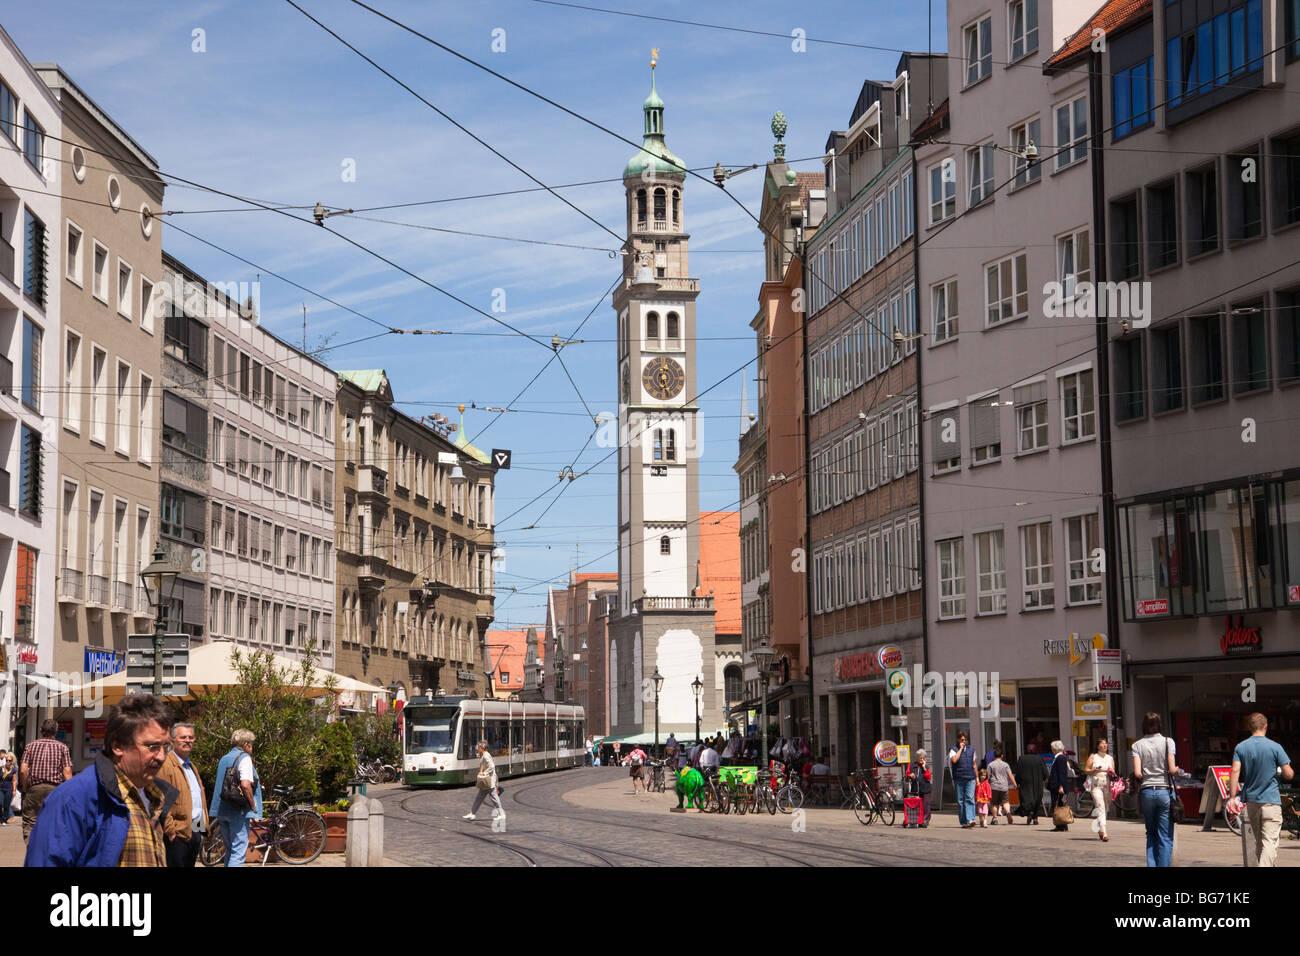 Maximilianstrasse Augsburg Bavaria Germany. City centre street scene with Perlachturm clock tower beyond. - Stock Image